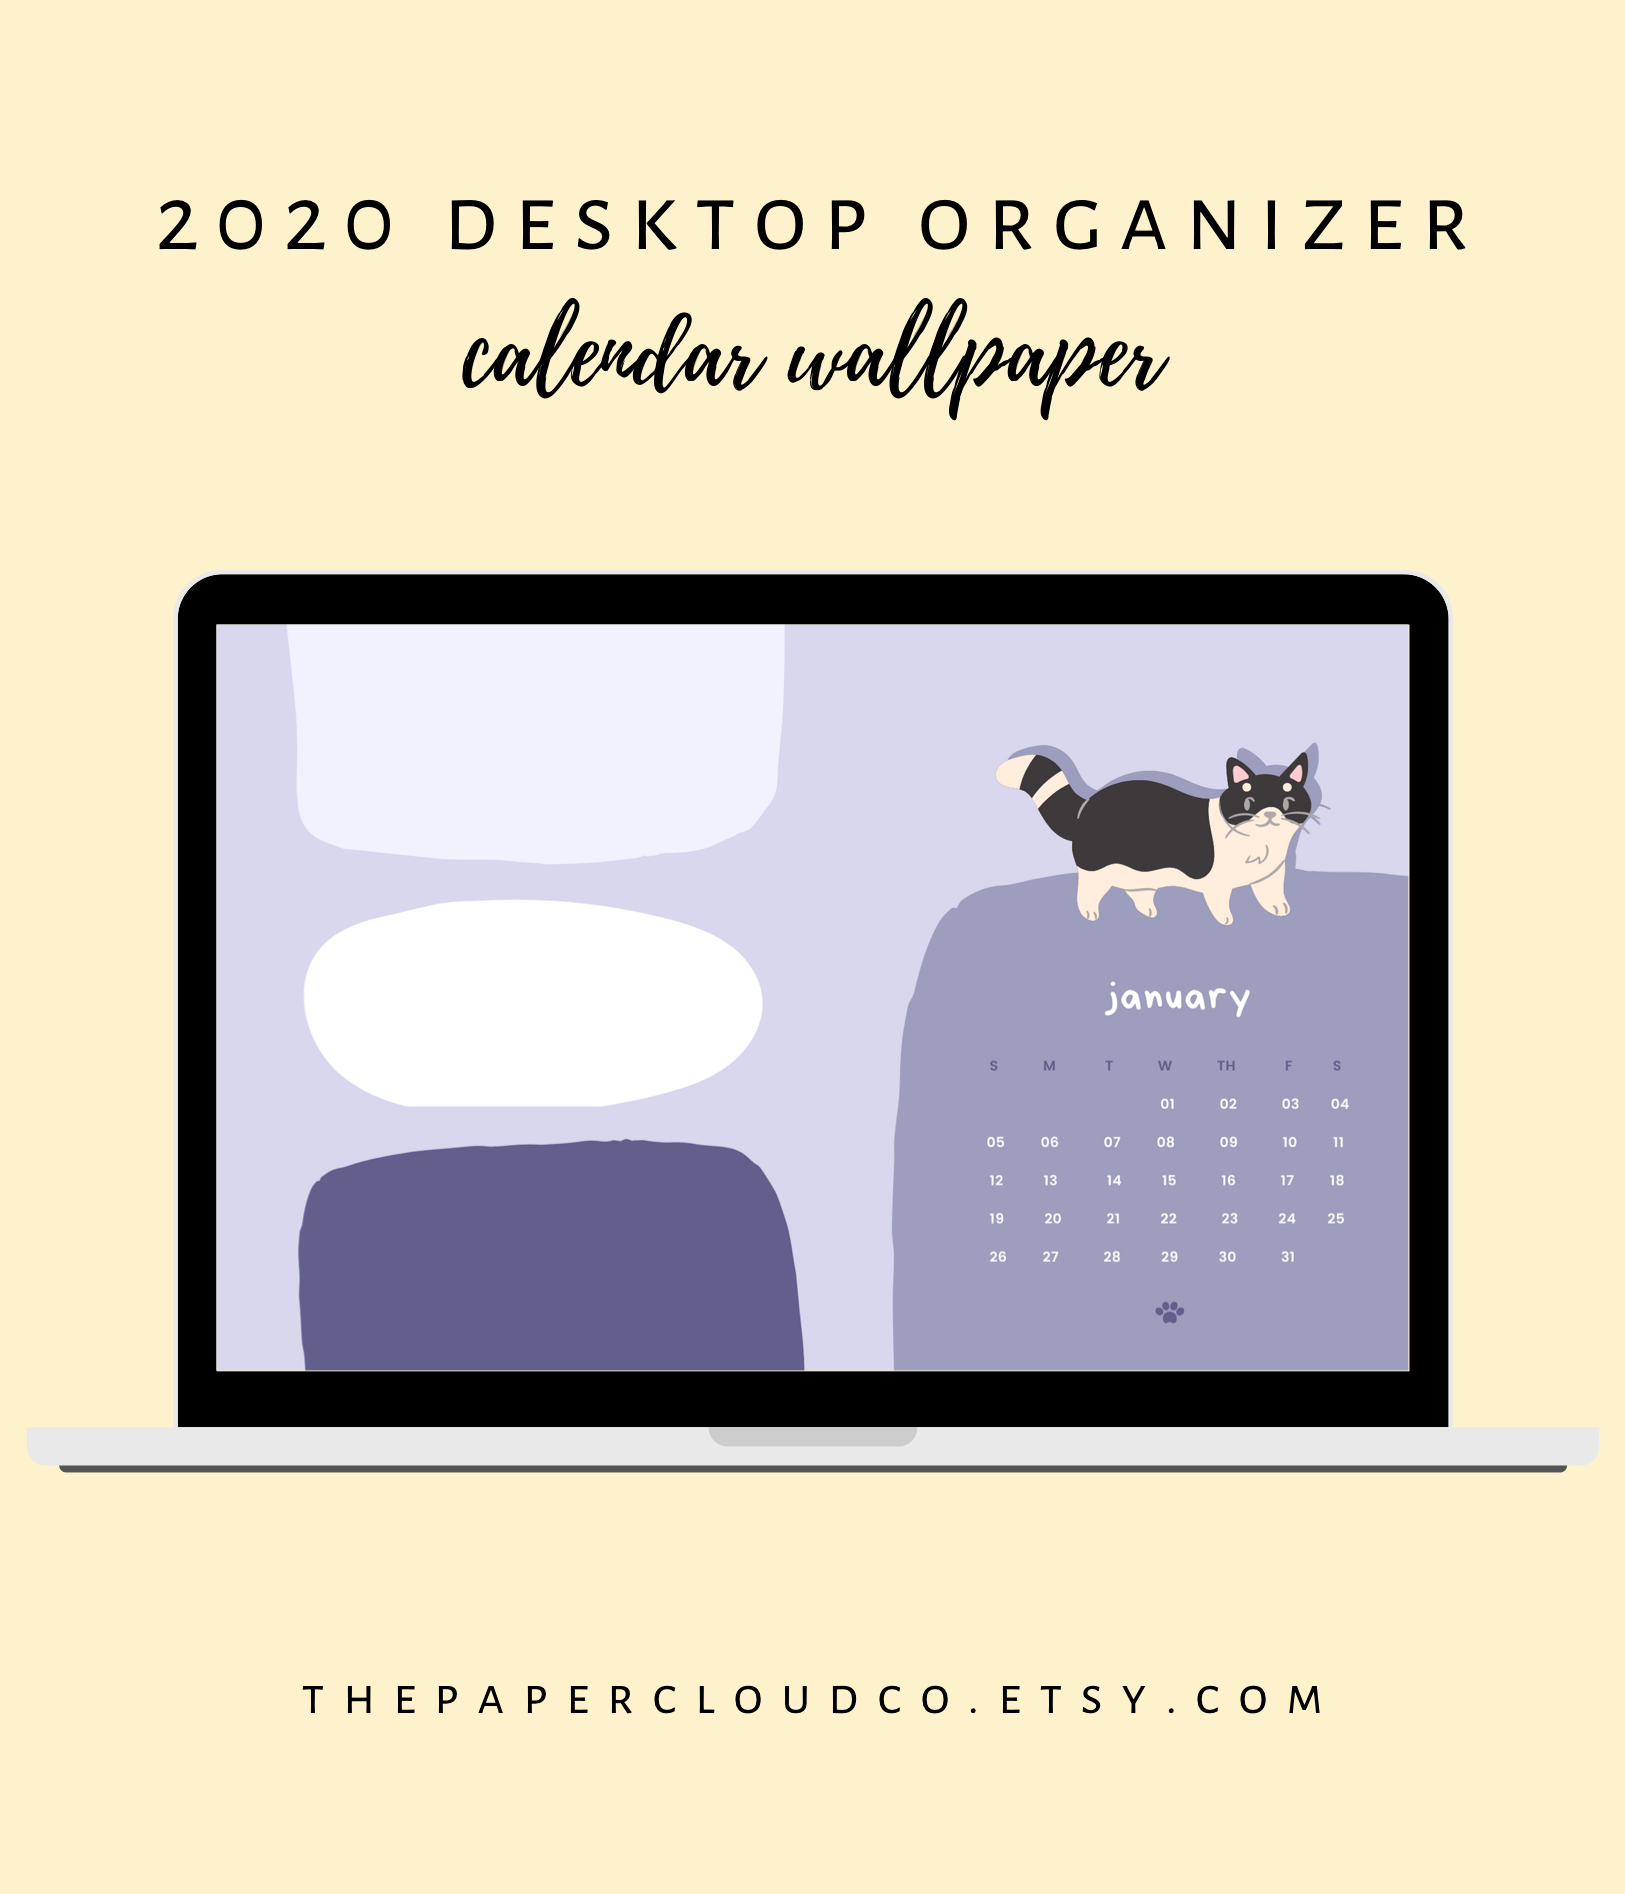 Cute Desktop Organizer Wallpaper with 2020 Monthly